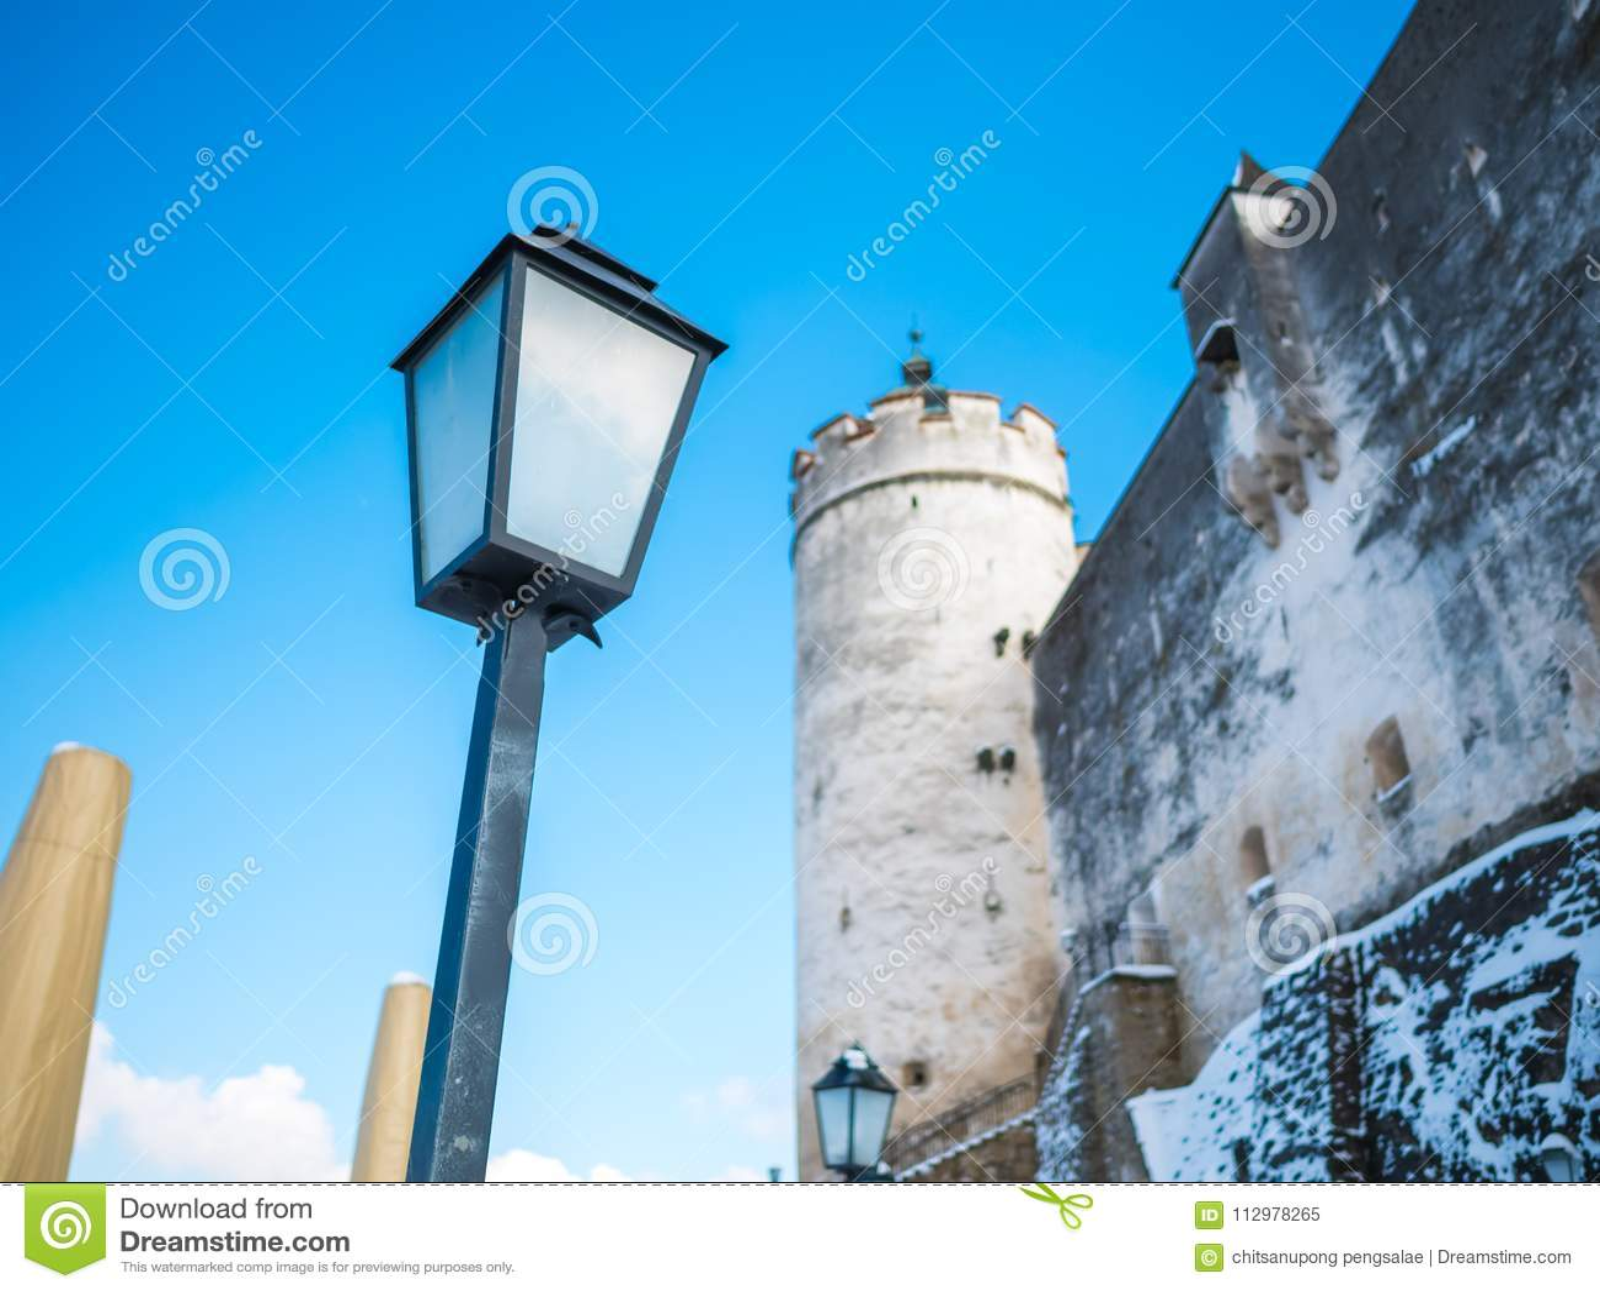 Lamp light fortress castle blue sky salzburg austria winter snow